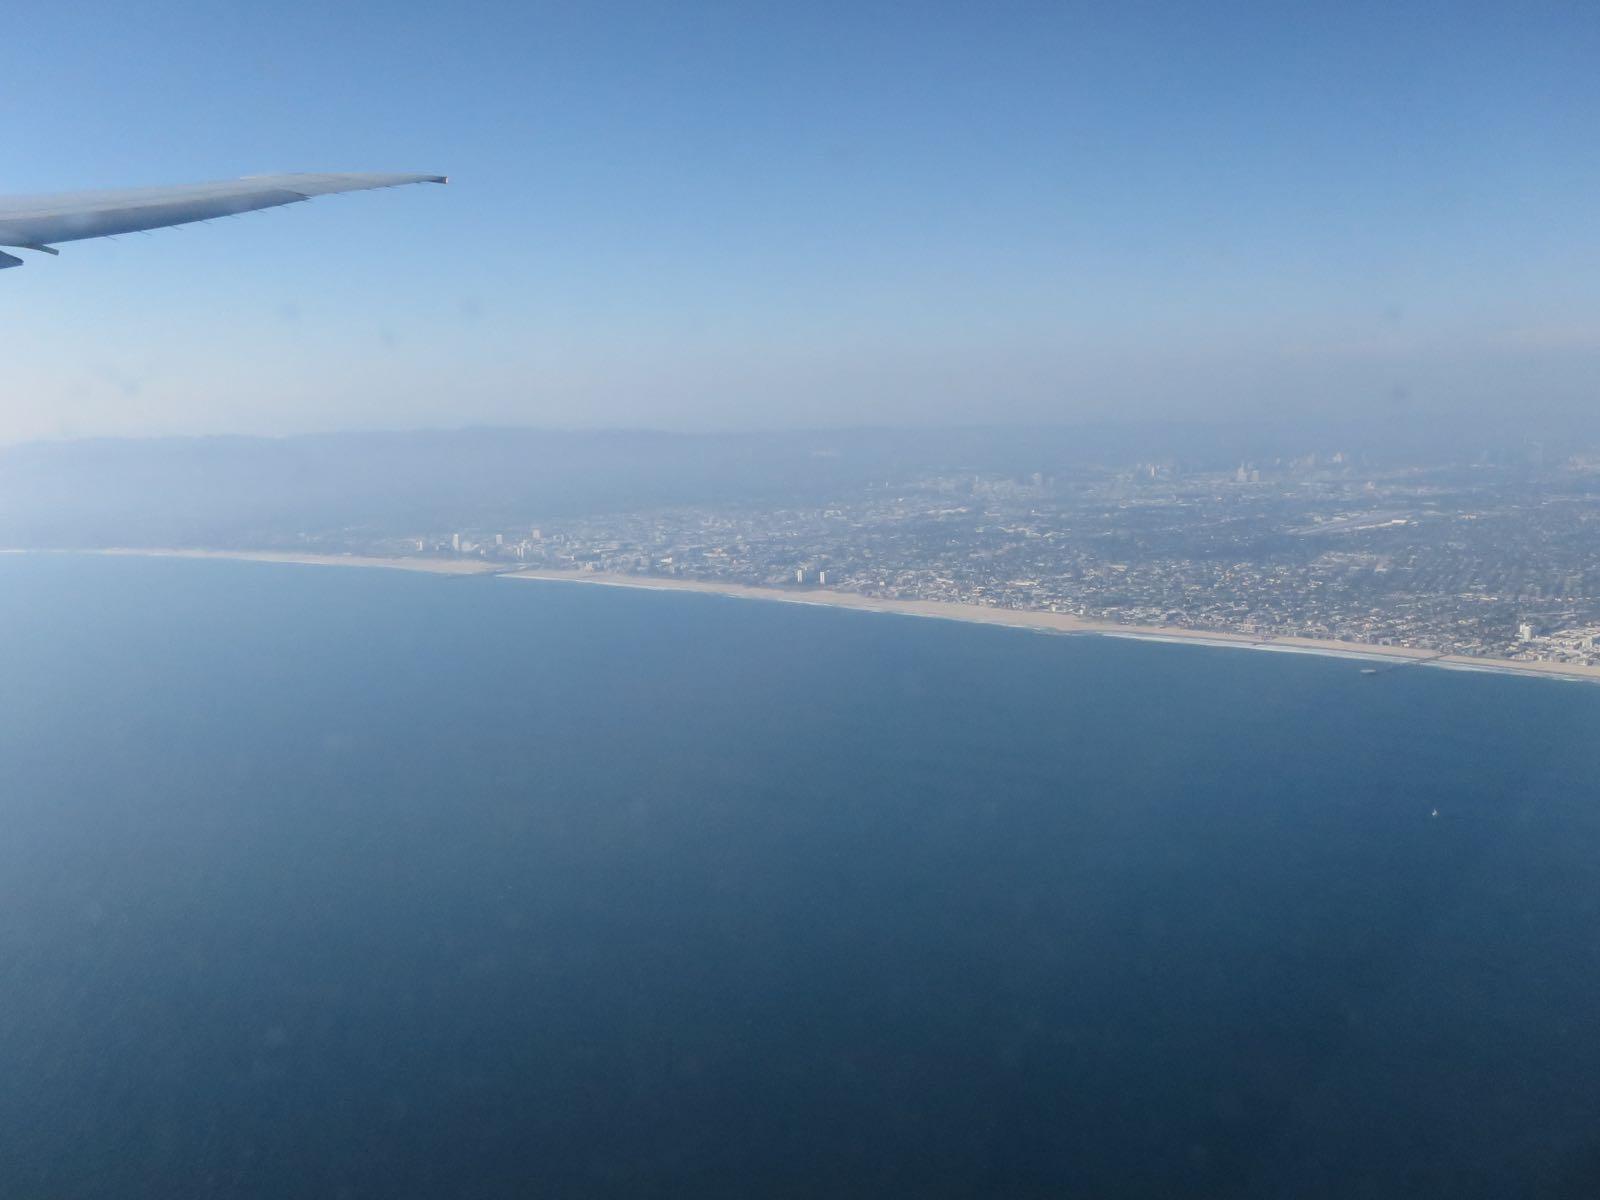 Hei hei, Kalifornia!